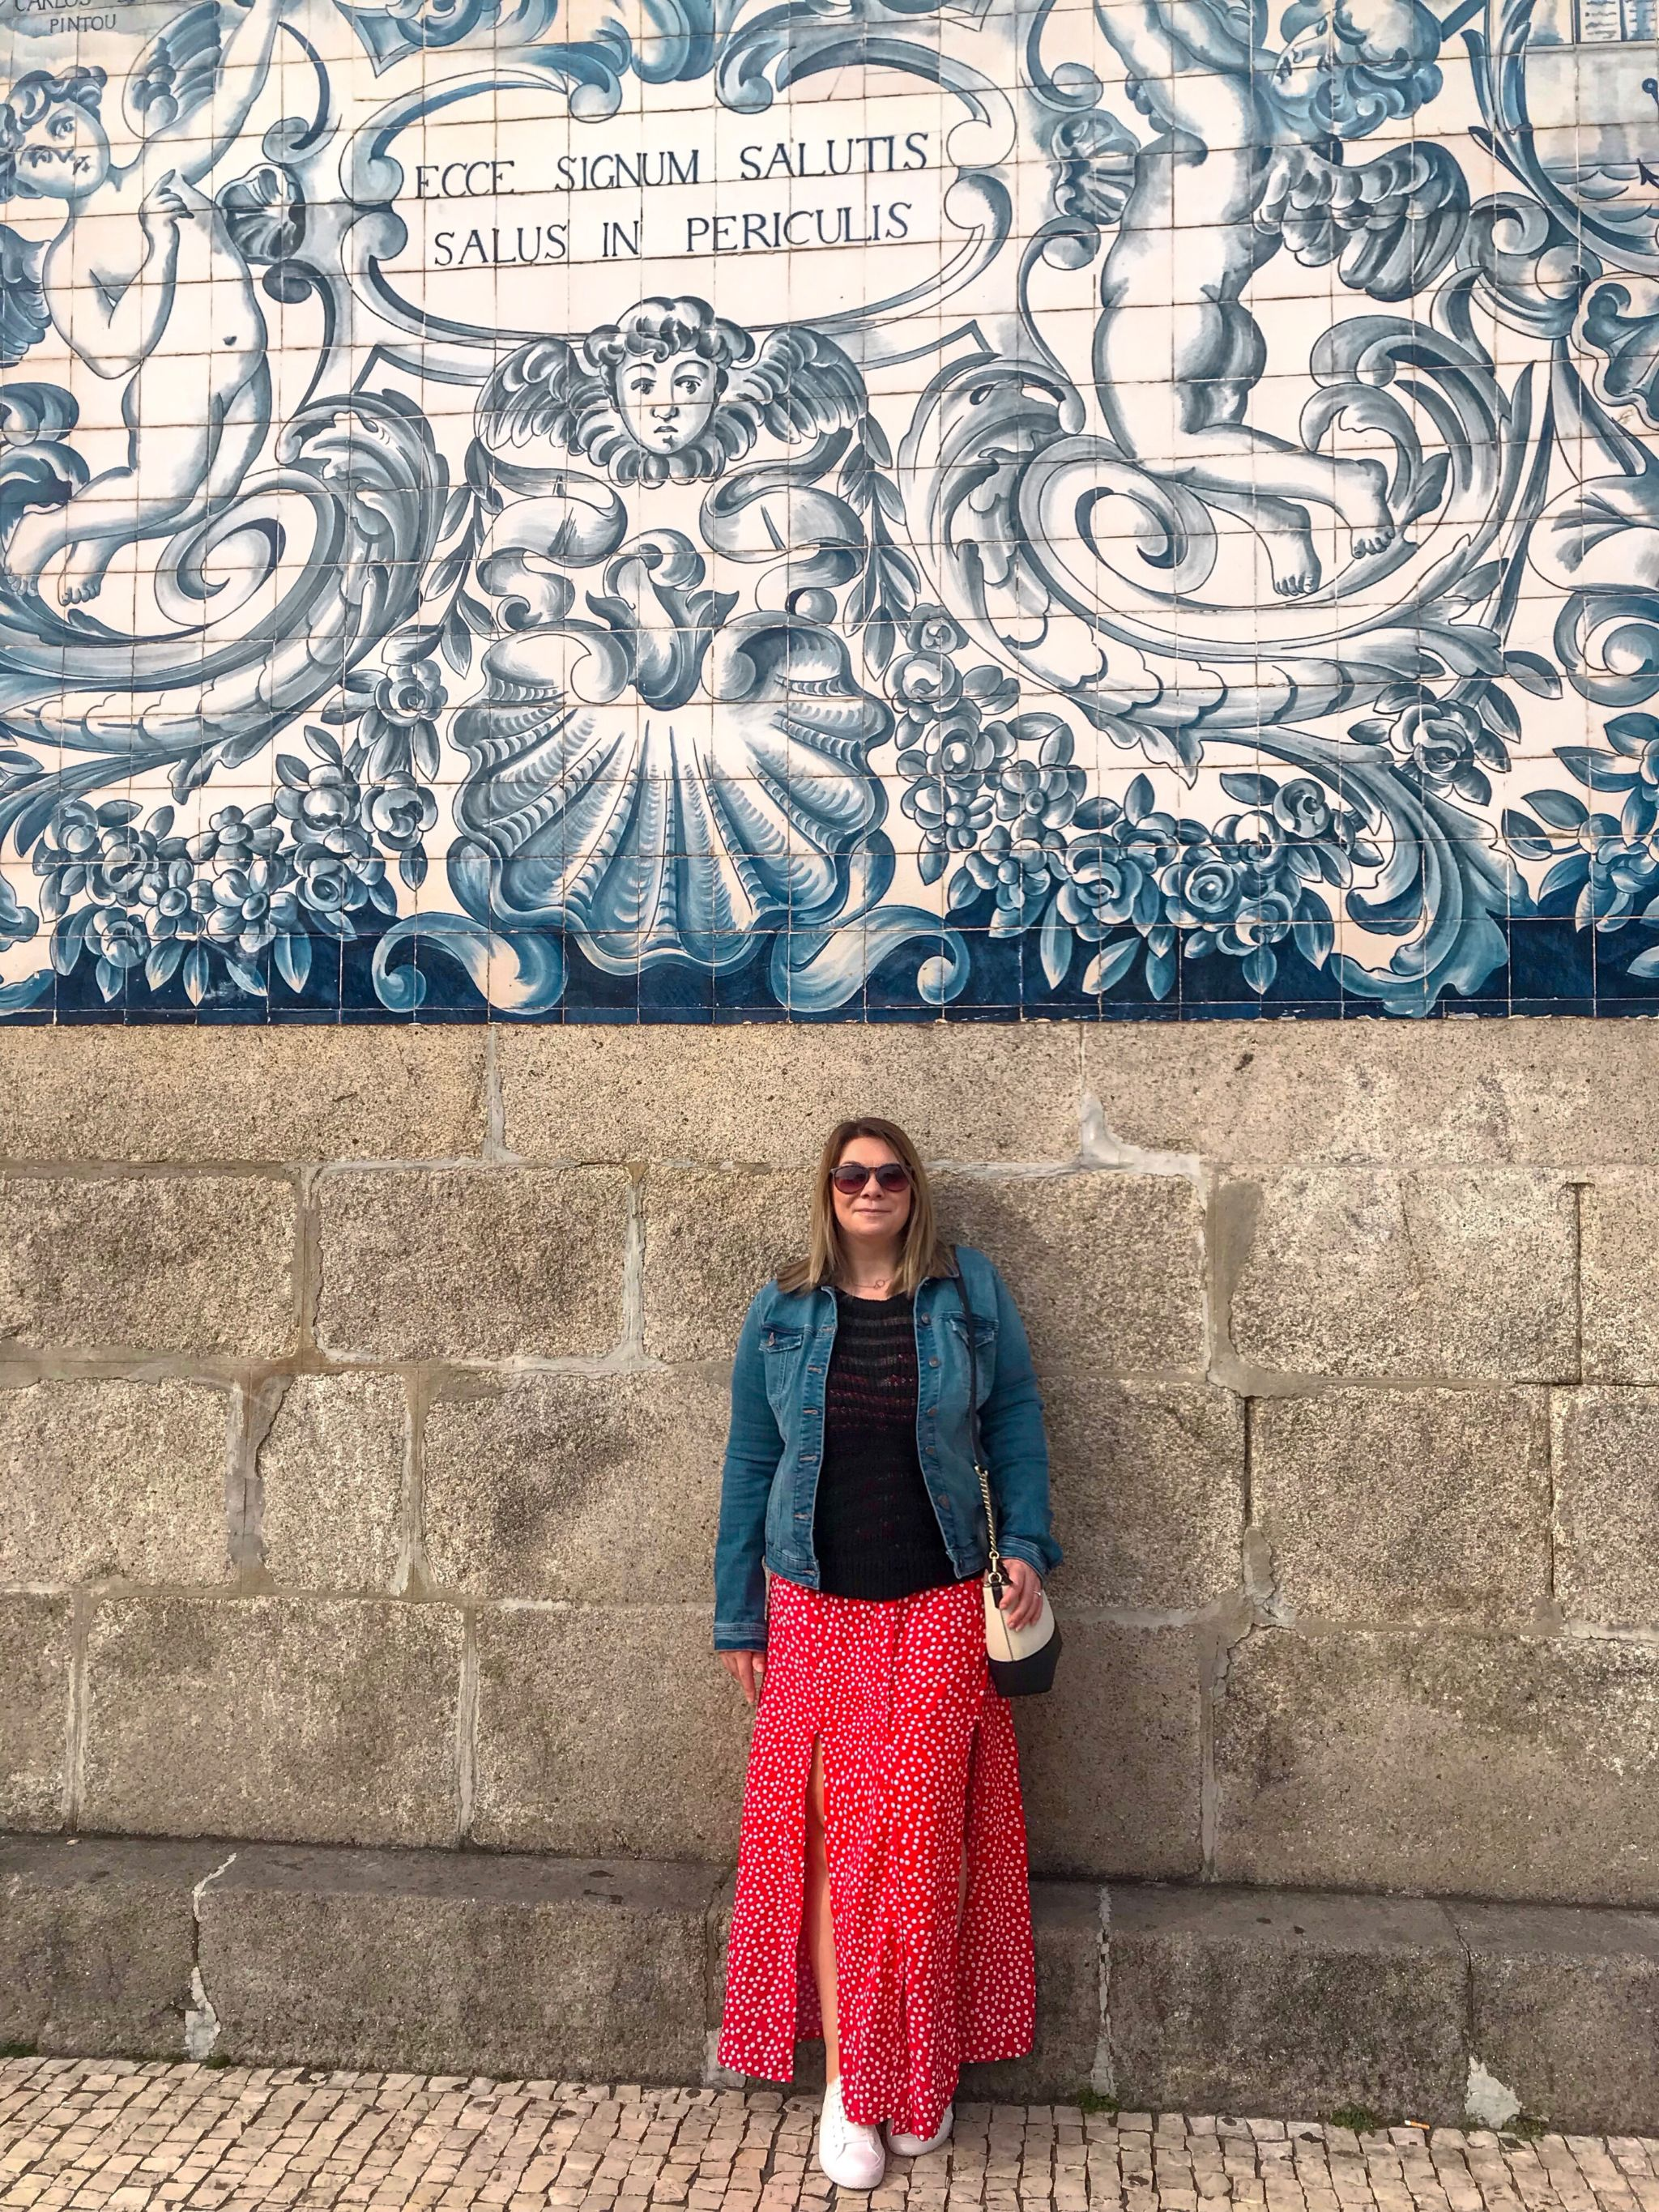 Porto Packing Guide Miss Selfridge Polka dot maxi dress